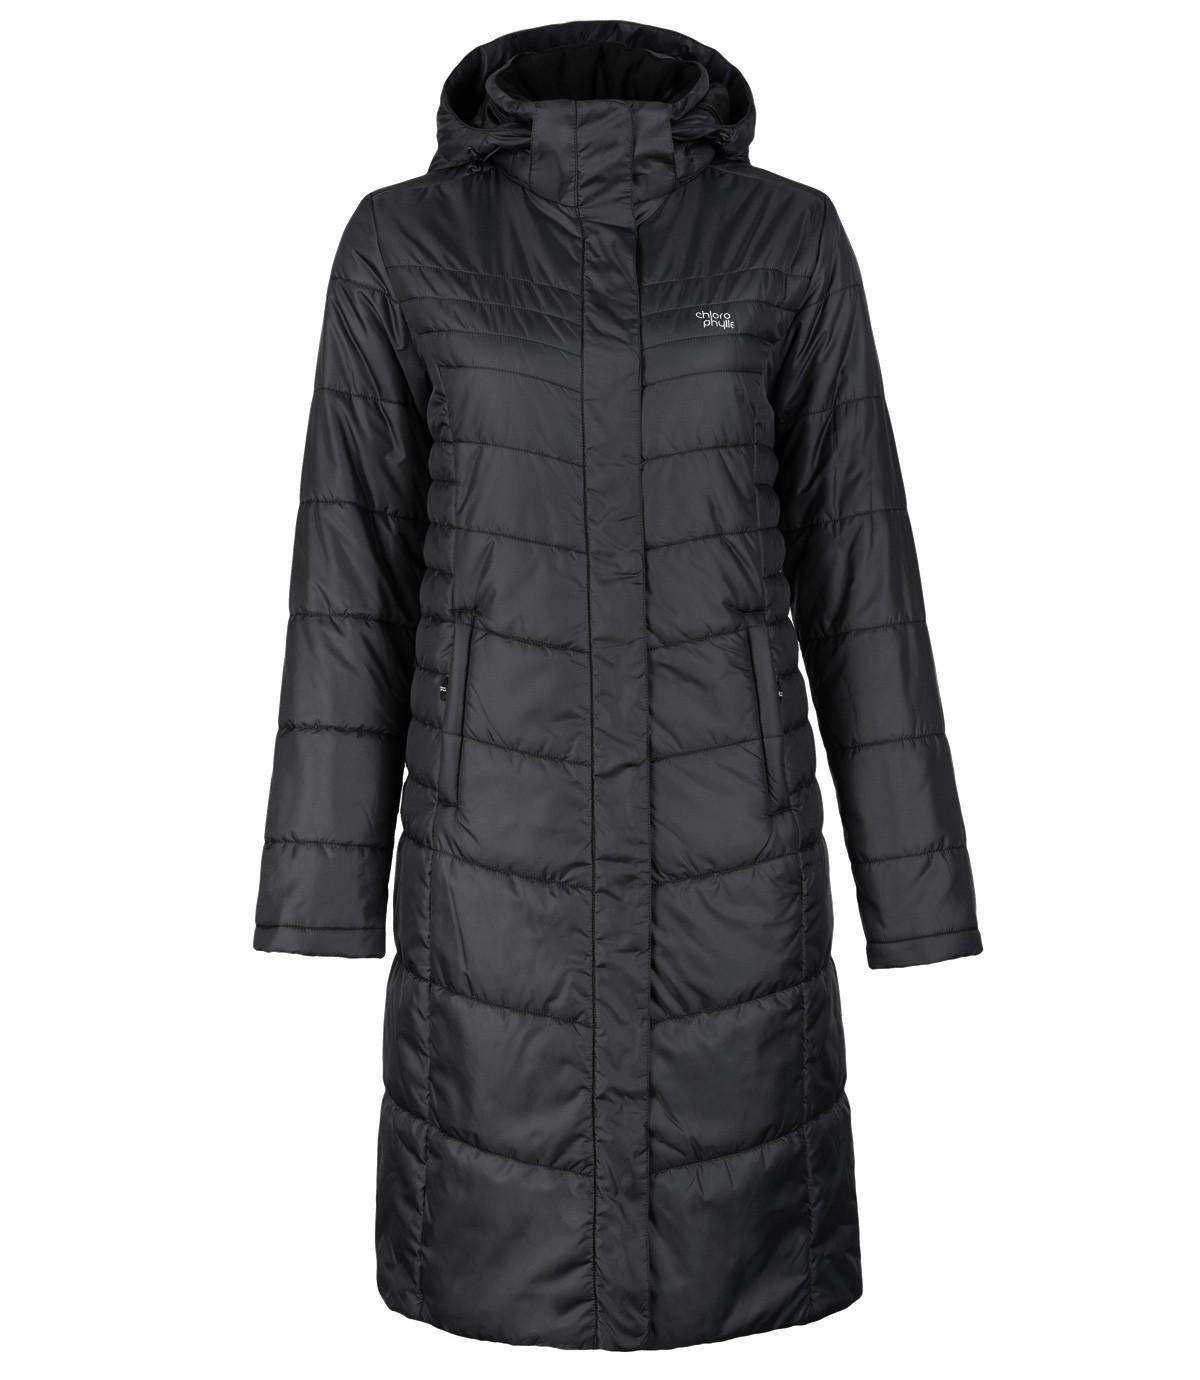 Manteau d'hiver femme chlorophylle